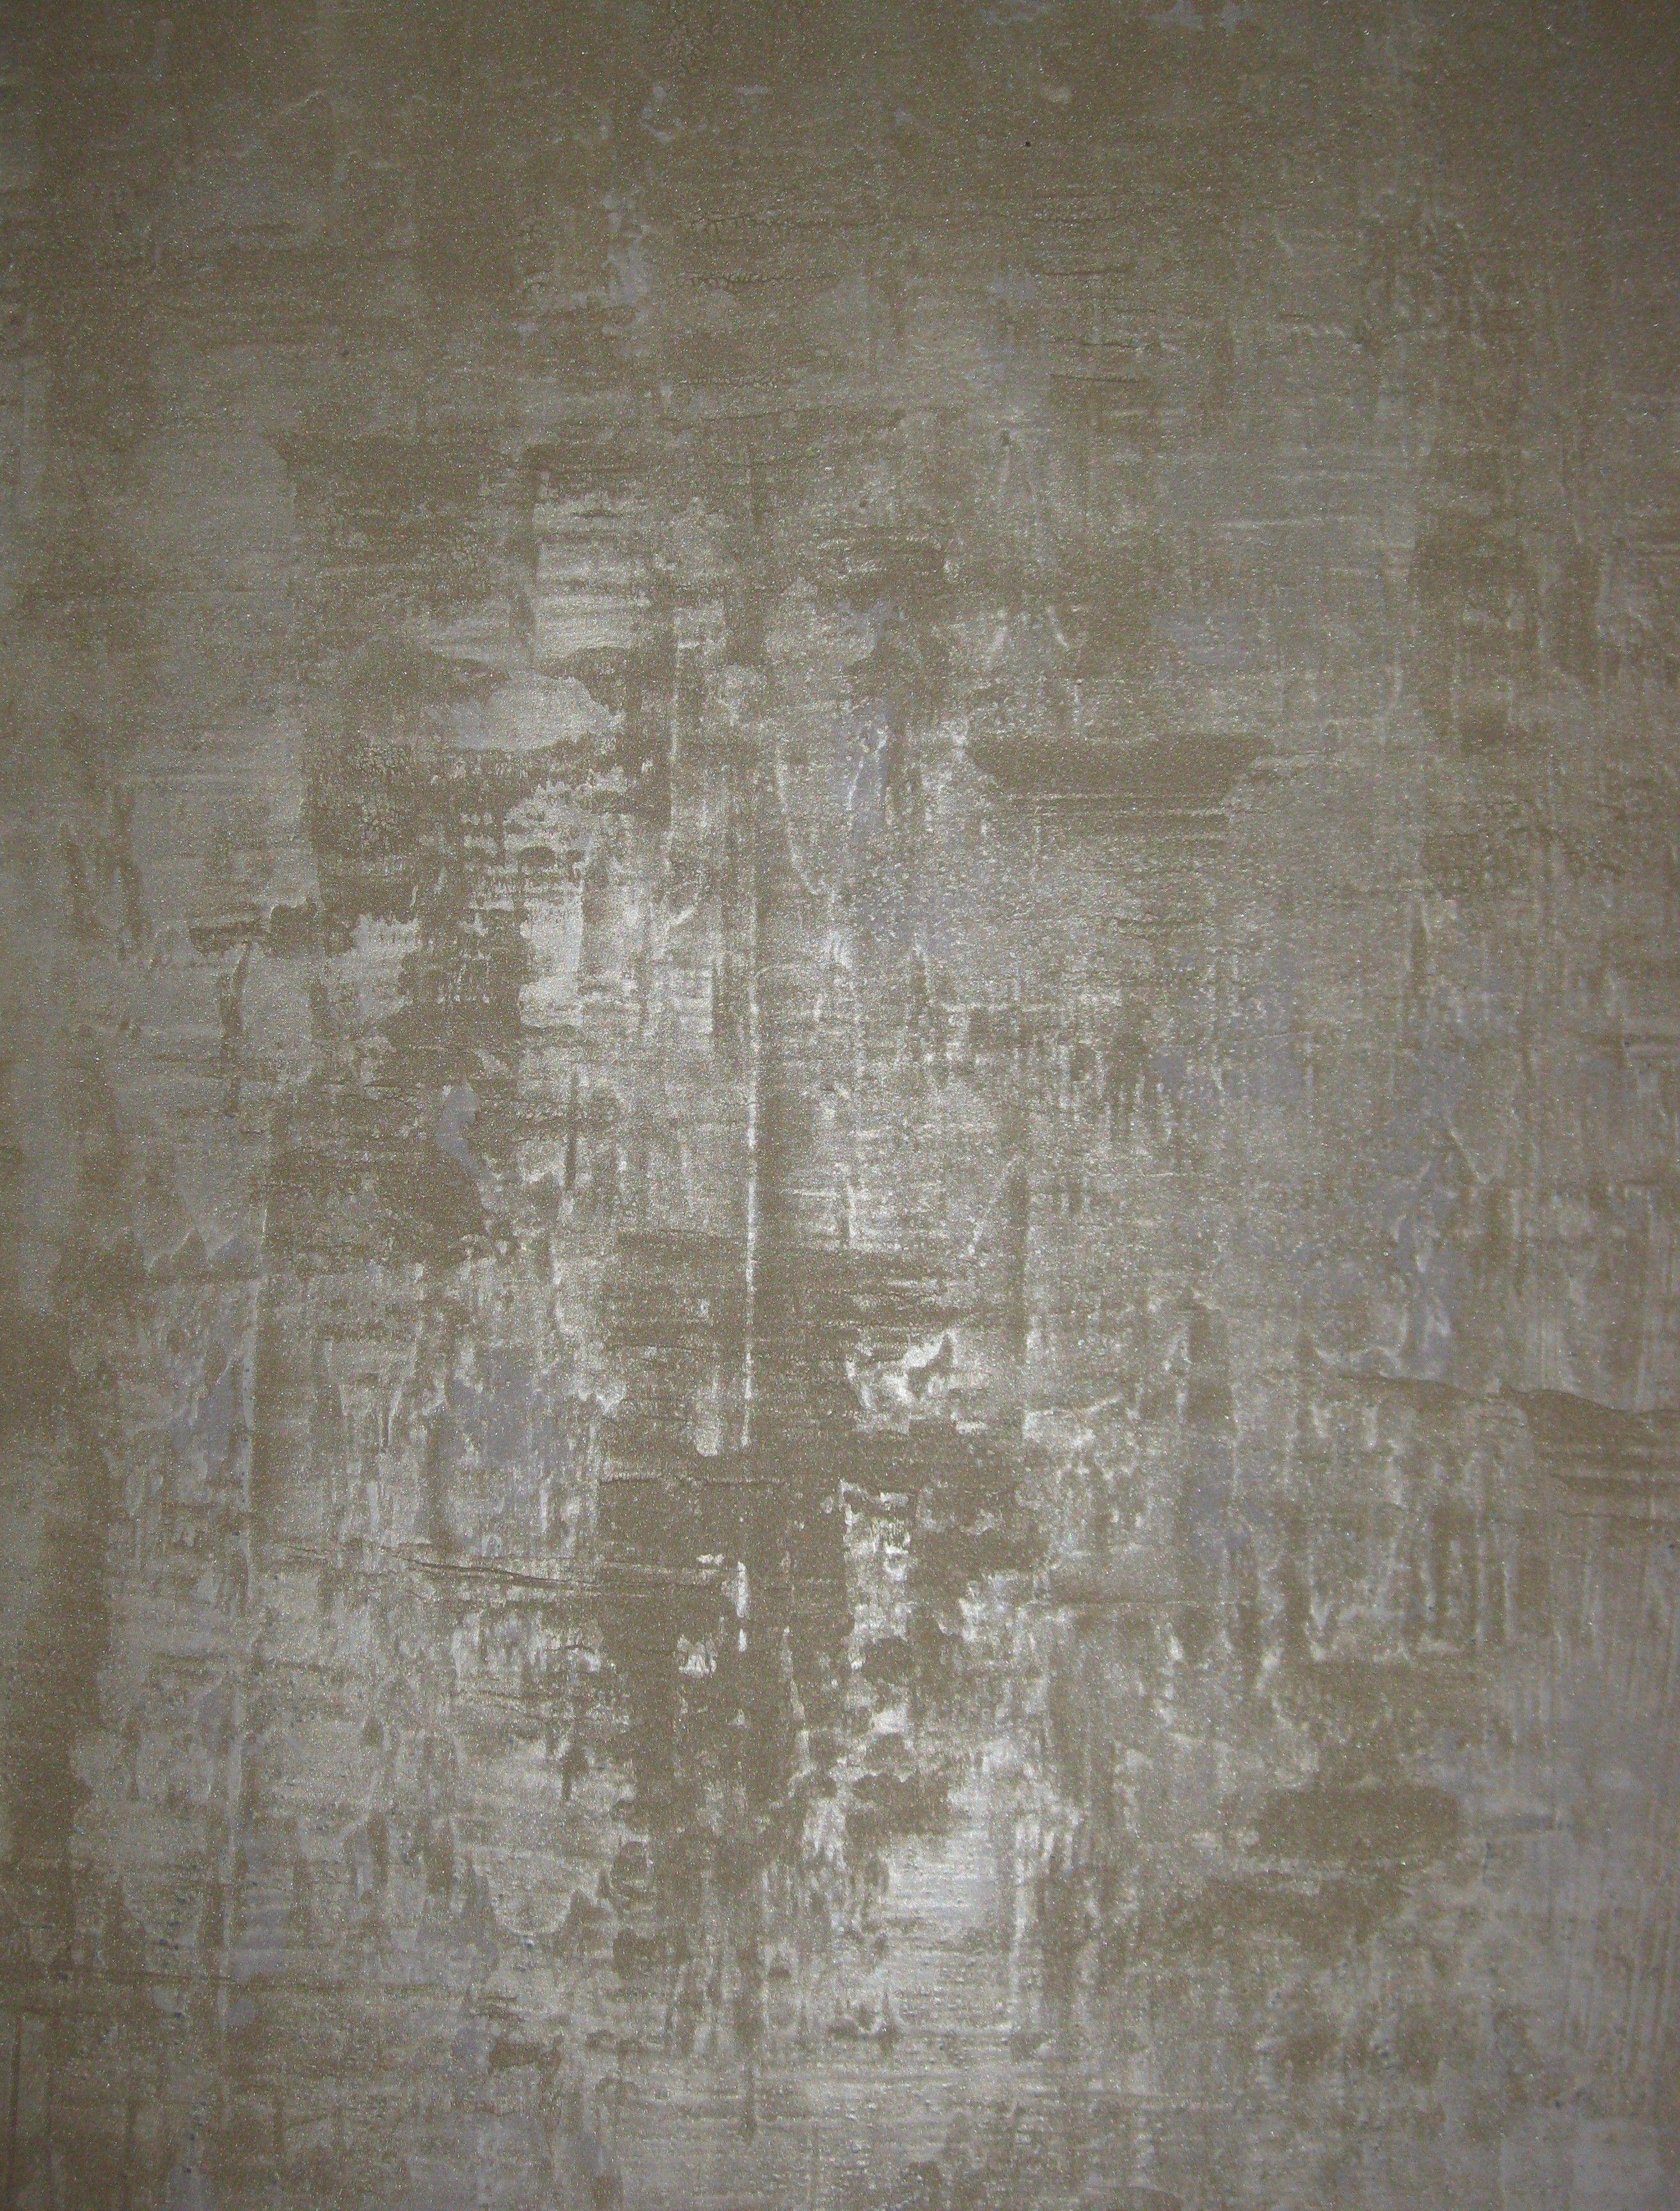 Venetian plaster with mica powder